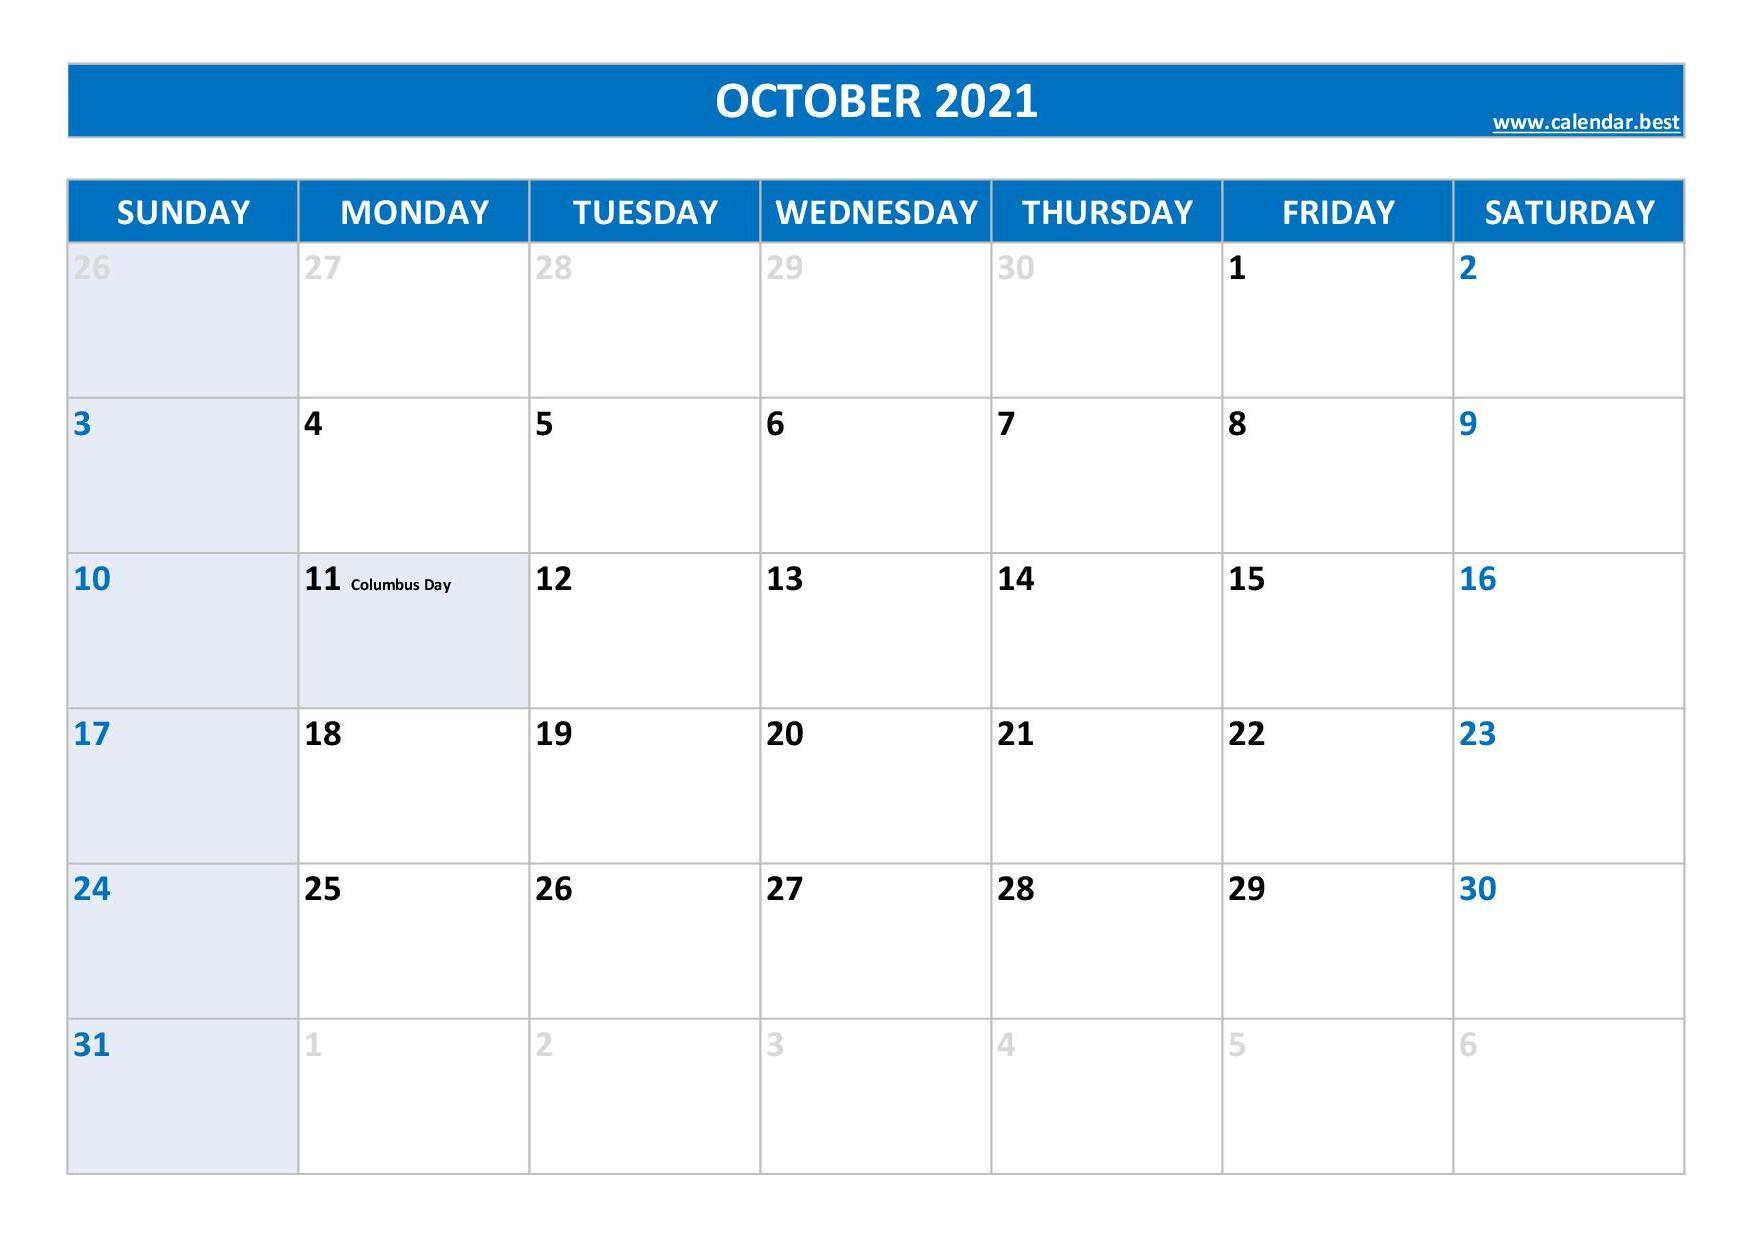 October 2021 Calendar -Calendar.best inside Calendar 2021 October Fill In